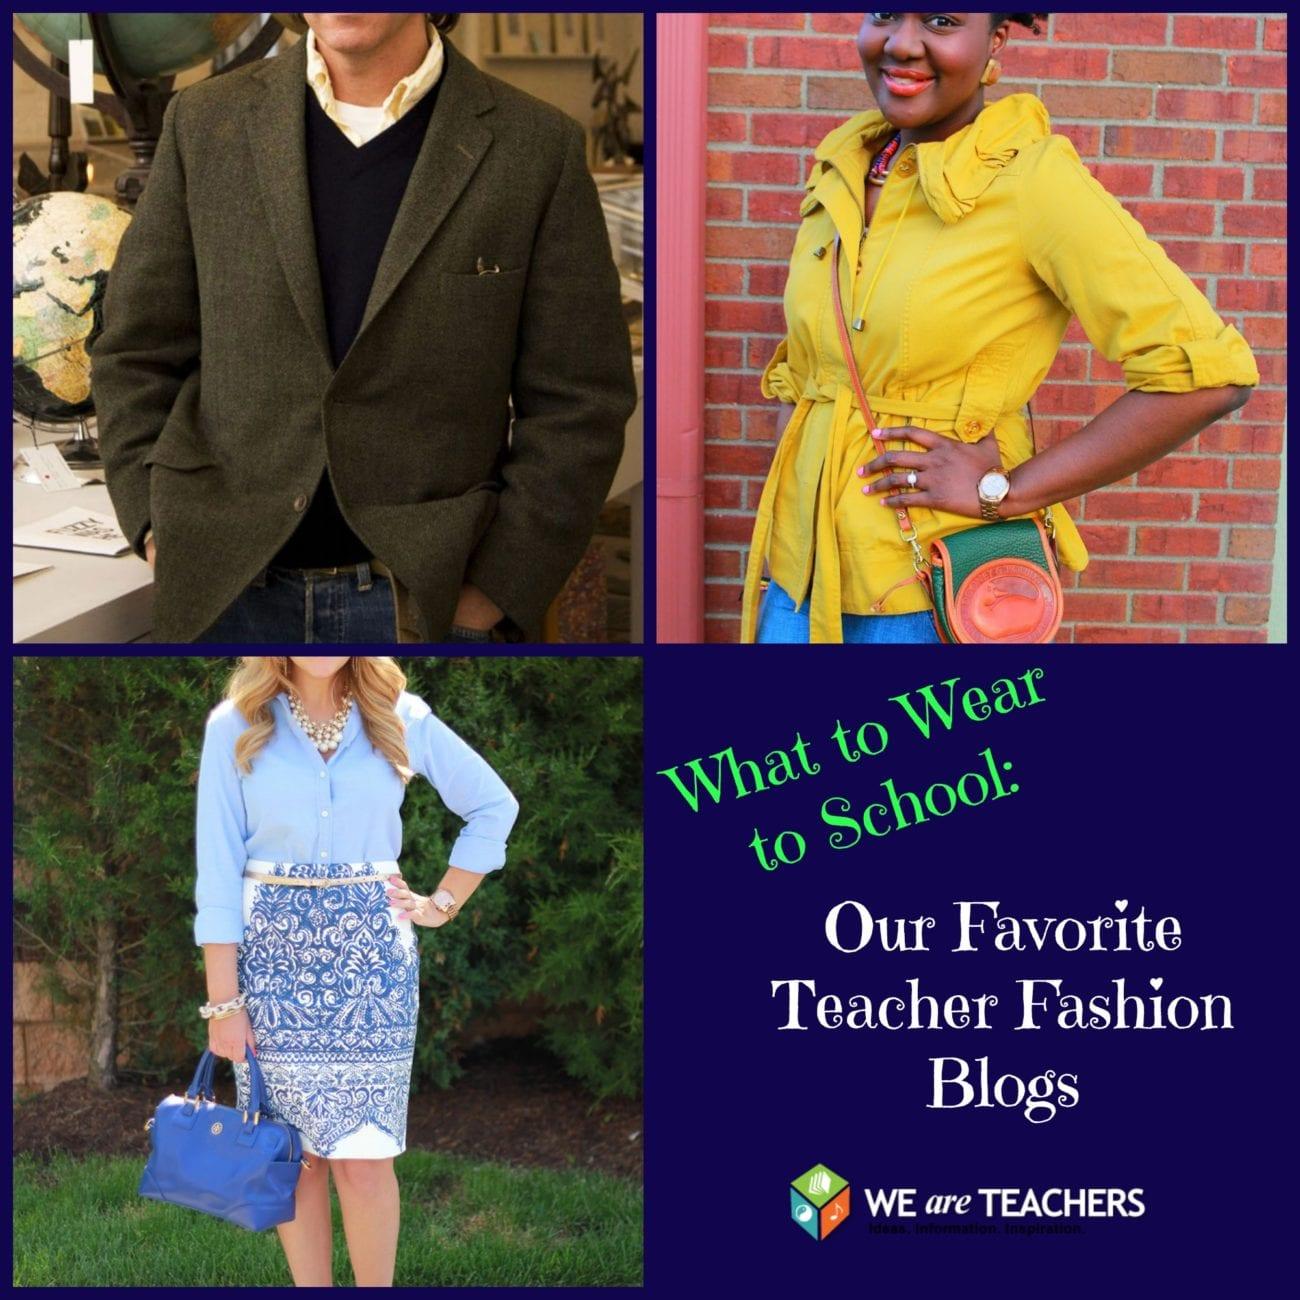 Our Favorite Teacher Fashion Blogs